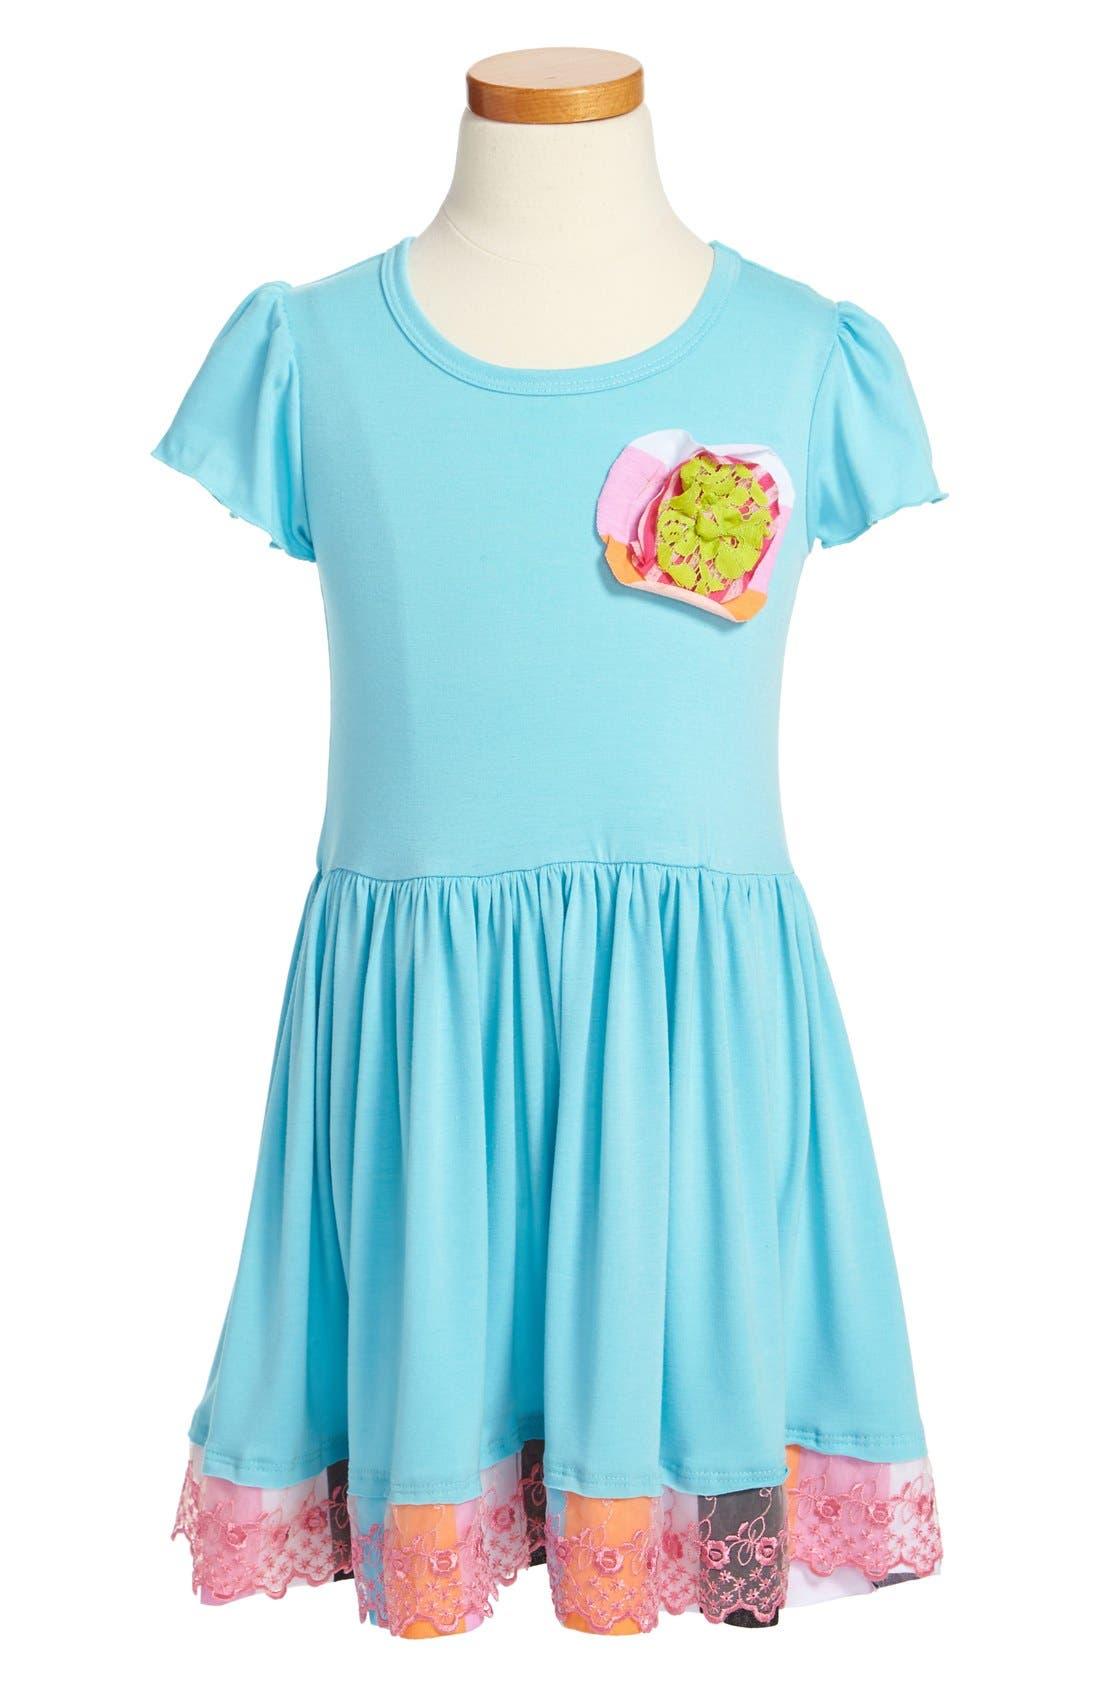 Main Image - Twirls & Twigs Contrast Ruffle Dress (Little Girls & Big Girls)